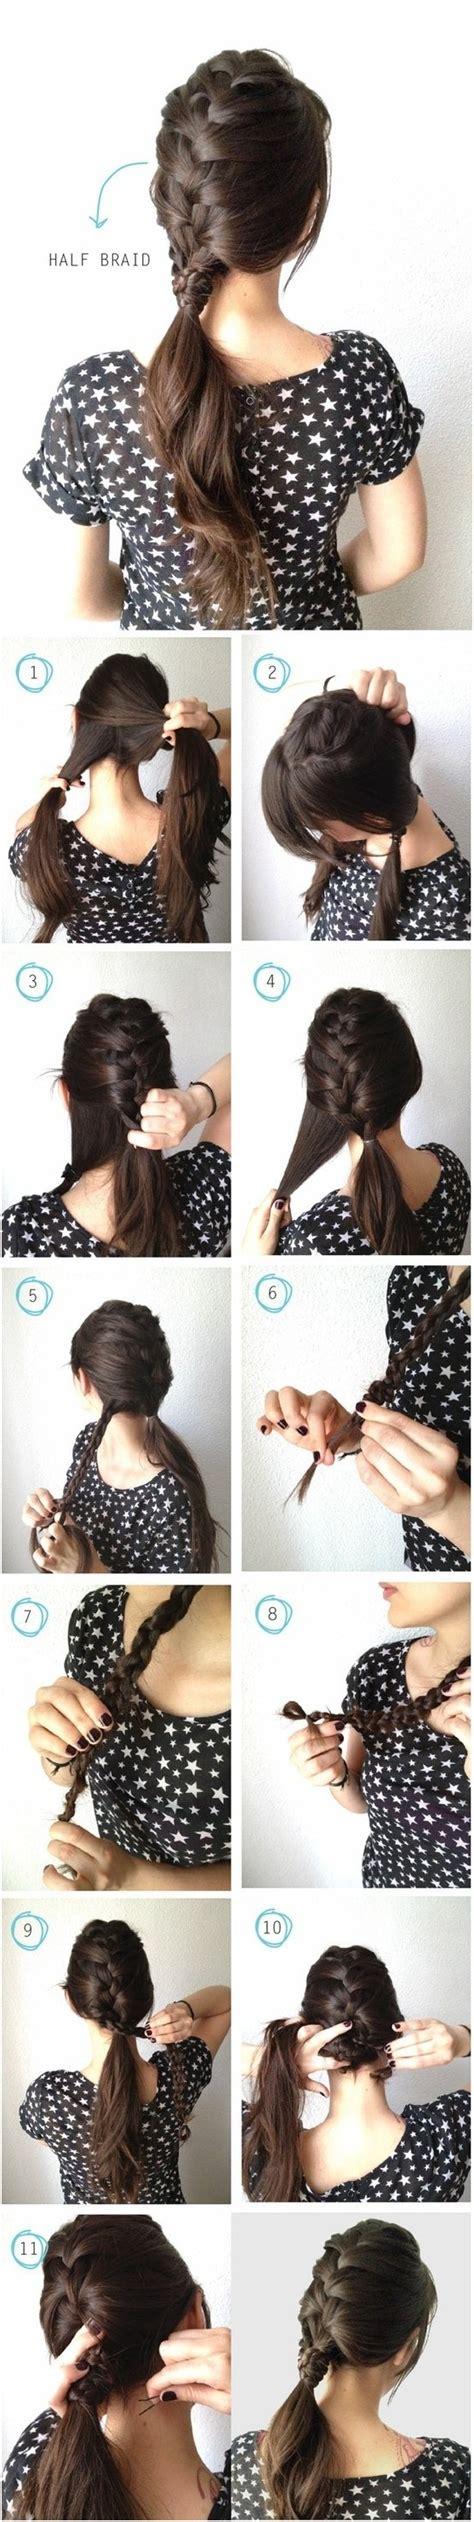 Easy Braided Hairstyles Tutorials by Braiding Hair For Beginners 21 Easy Tutorials